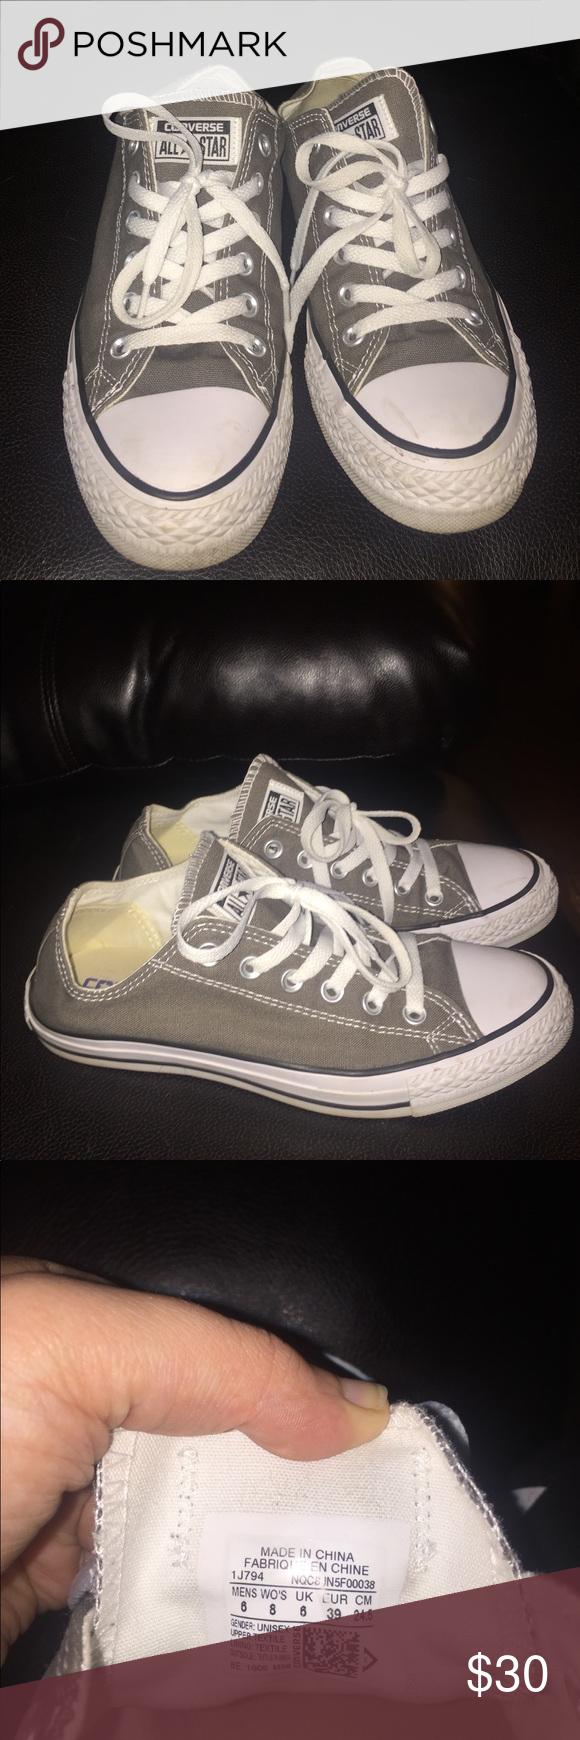 c70450b7945e Women s Converse Sneaker size 8 gray